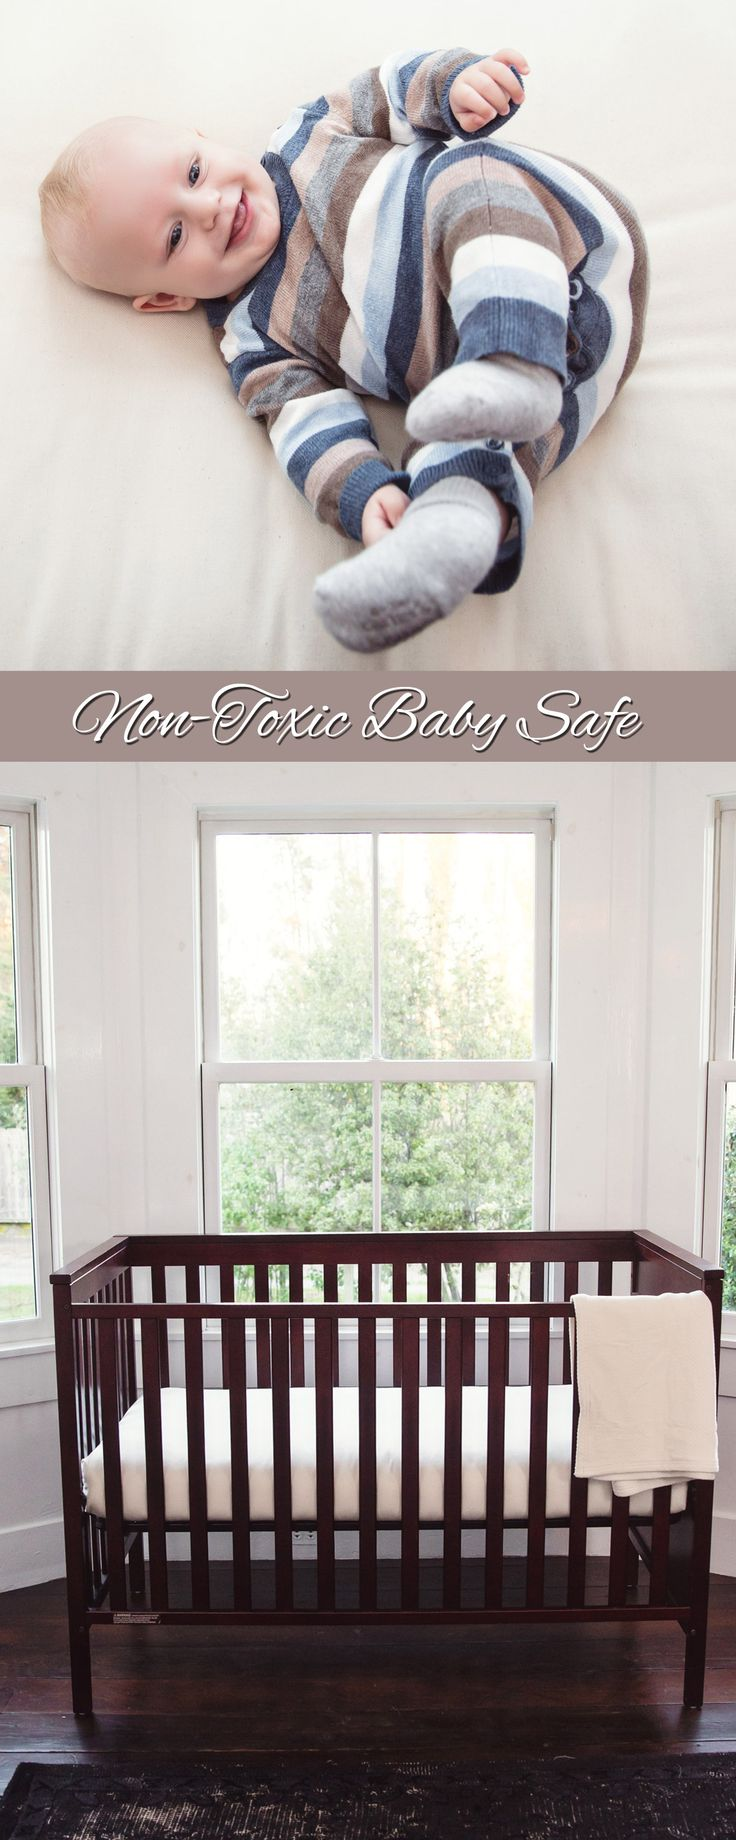 Organic Cotton Crib Mattress by The Futon Shop - Baby Bed Mattress